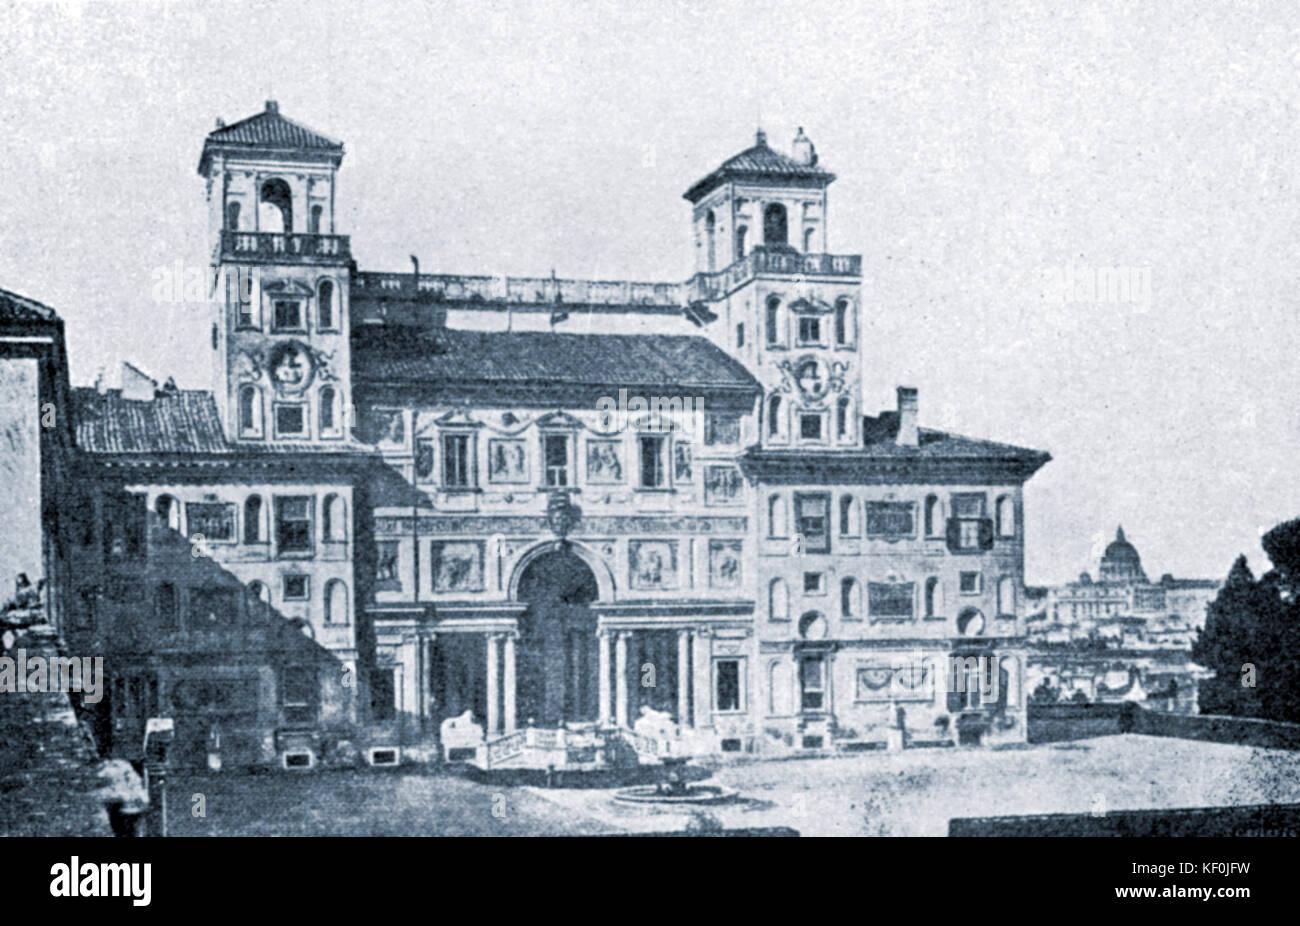 Villa Medici on Monte Pincio in Rome - where Hector Berlioz won music prize. French composer, 11 December 1803  - Stock Image